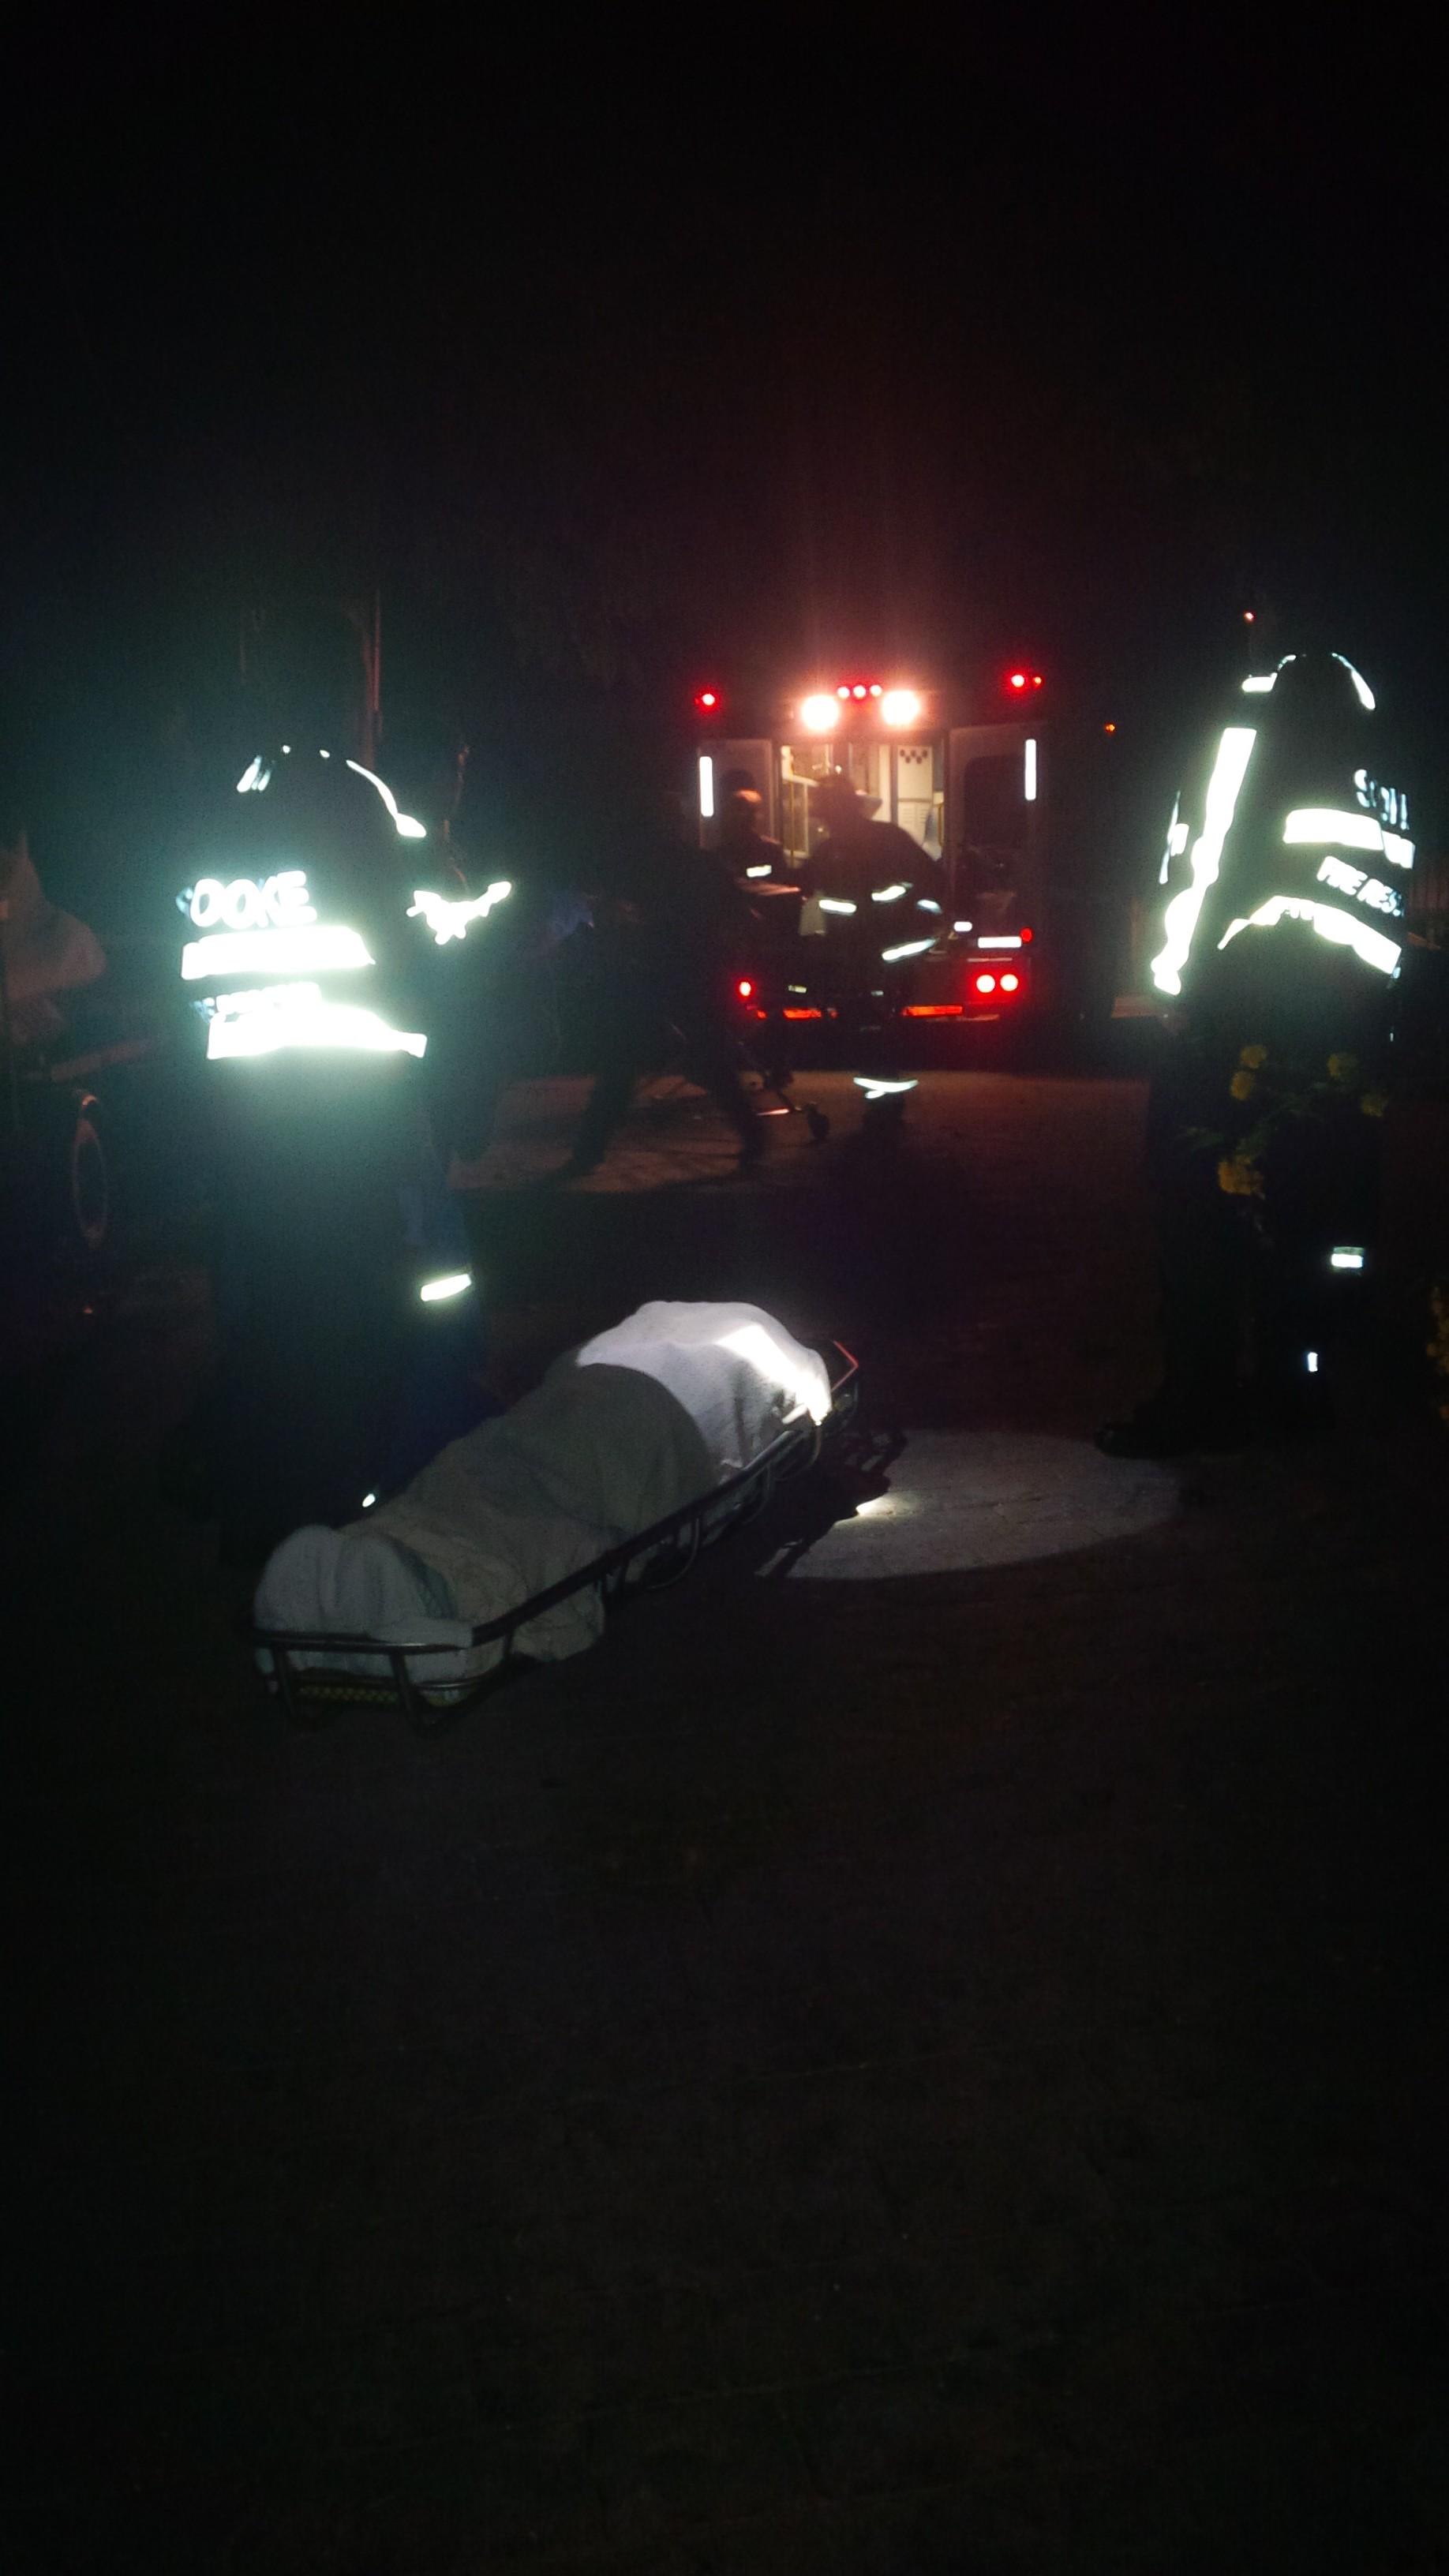 stretcher, neck brace, basket, blanket, paramedics, fire department